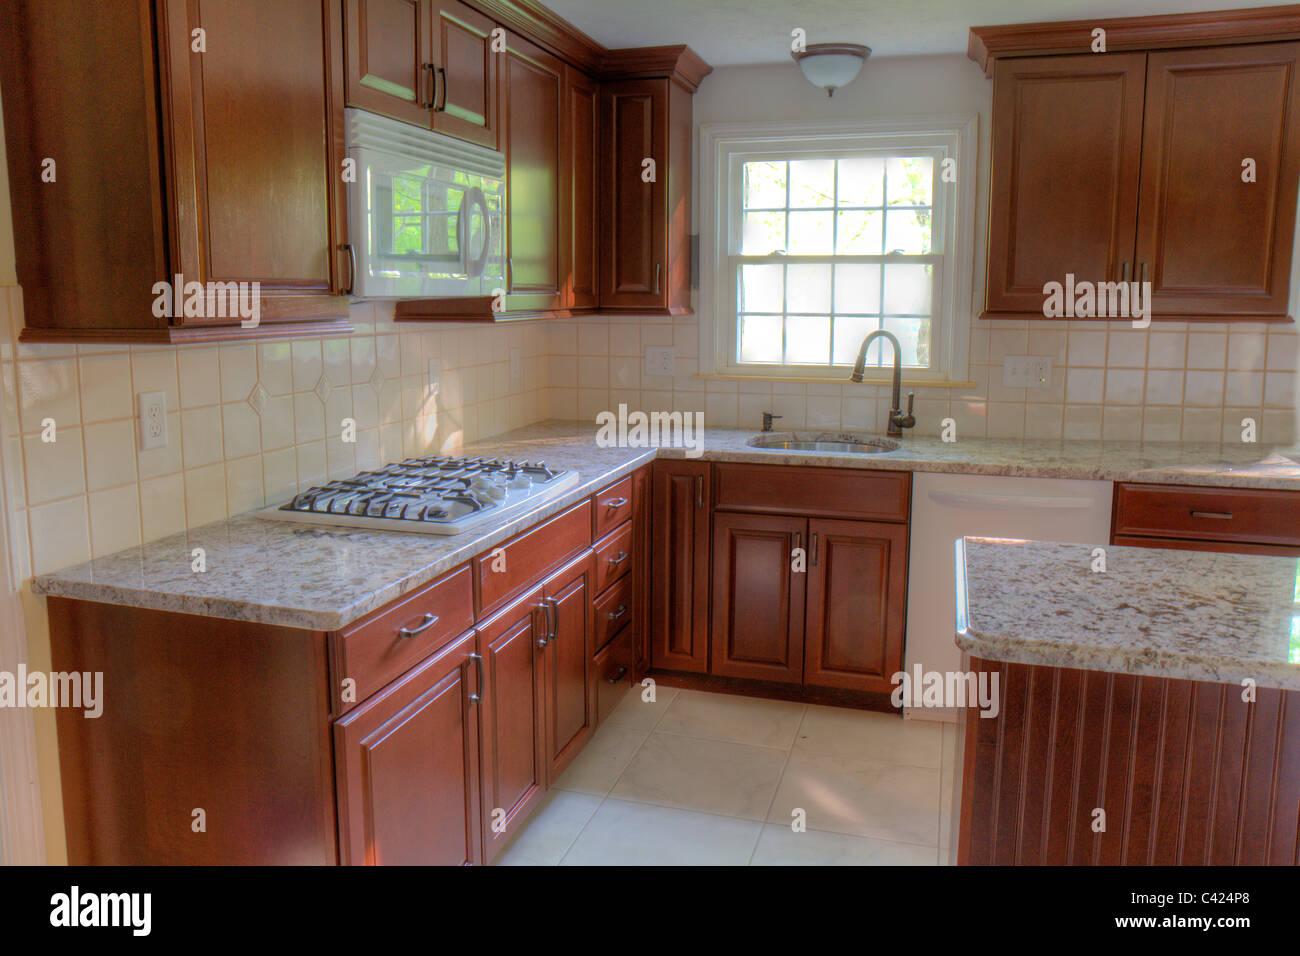 New Cherry Cabinets Granite Counter Tops And Ceramic